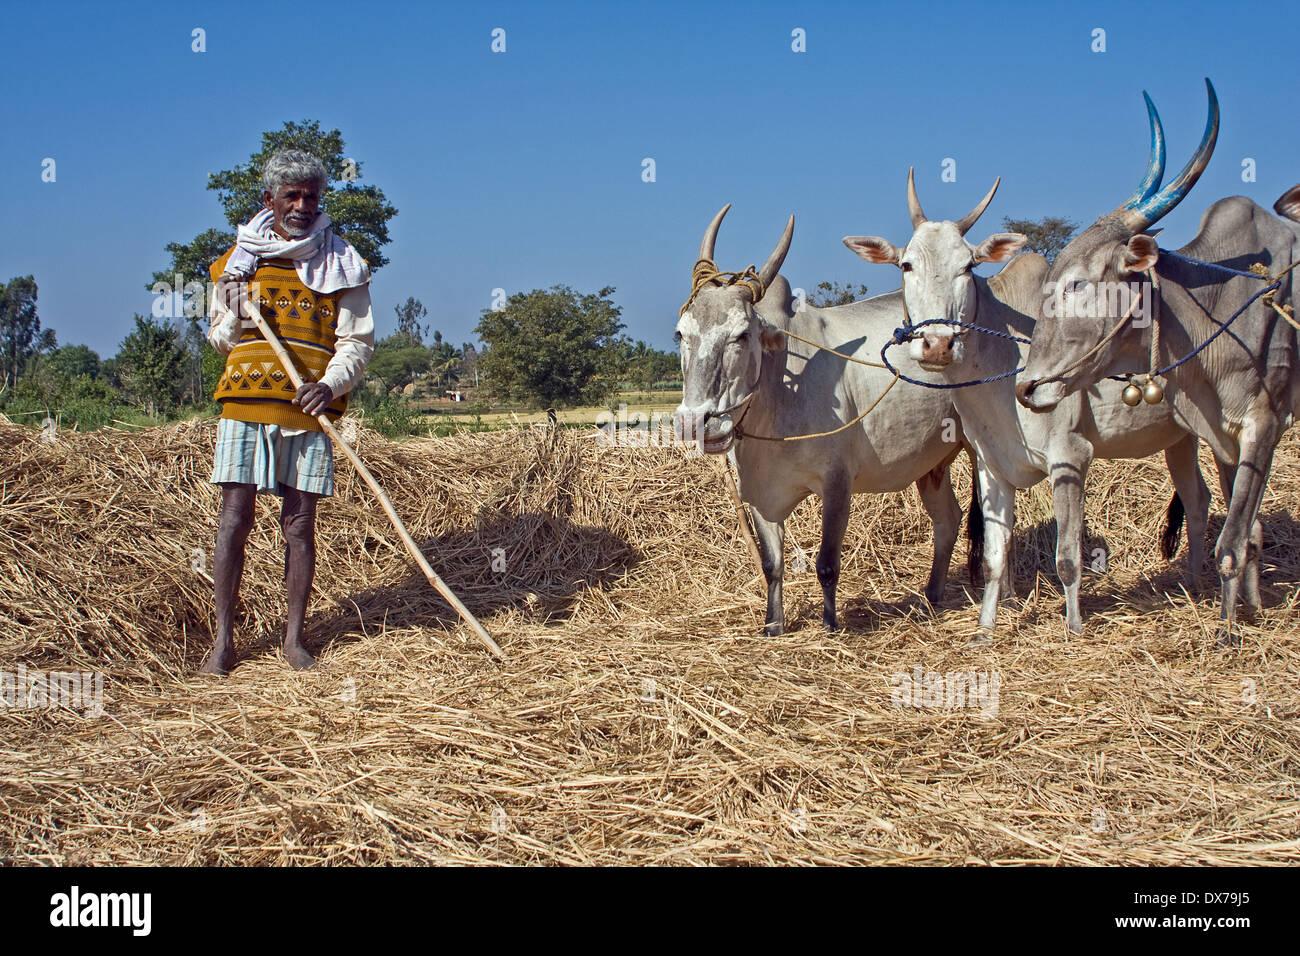 Asia, India, Karnataka, Somnathpur, farmer with his cows - Stock Image